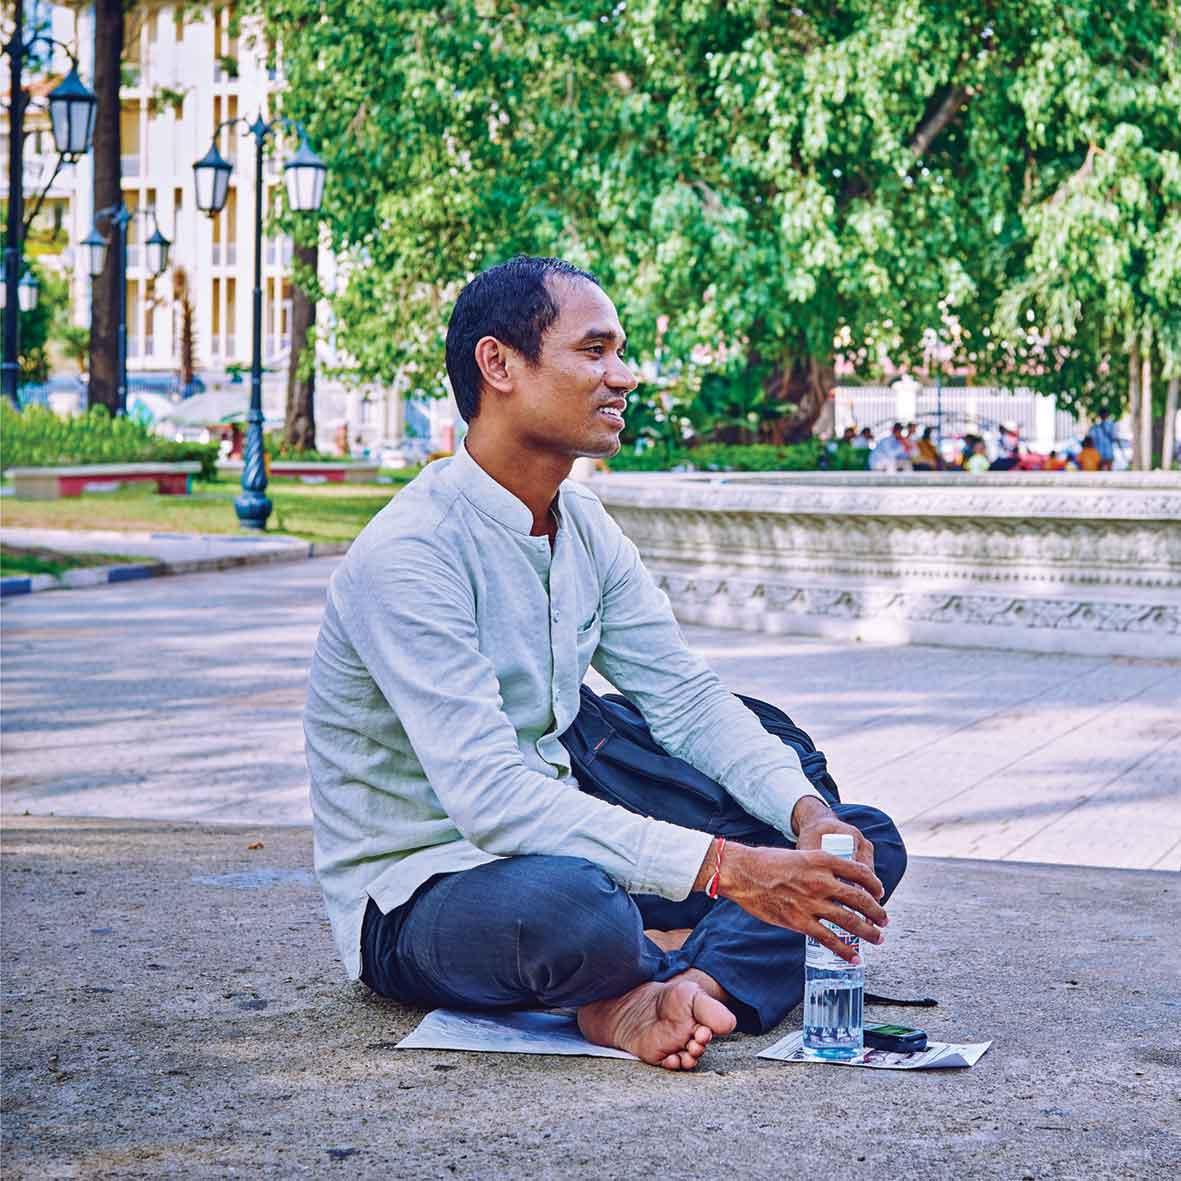 1.-Sometimes-Me_-Pich-Sarath_1000x700mm.jpg